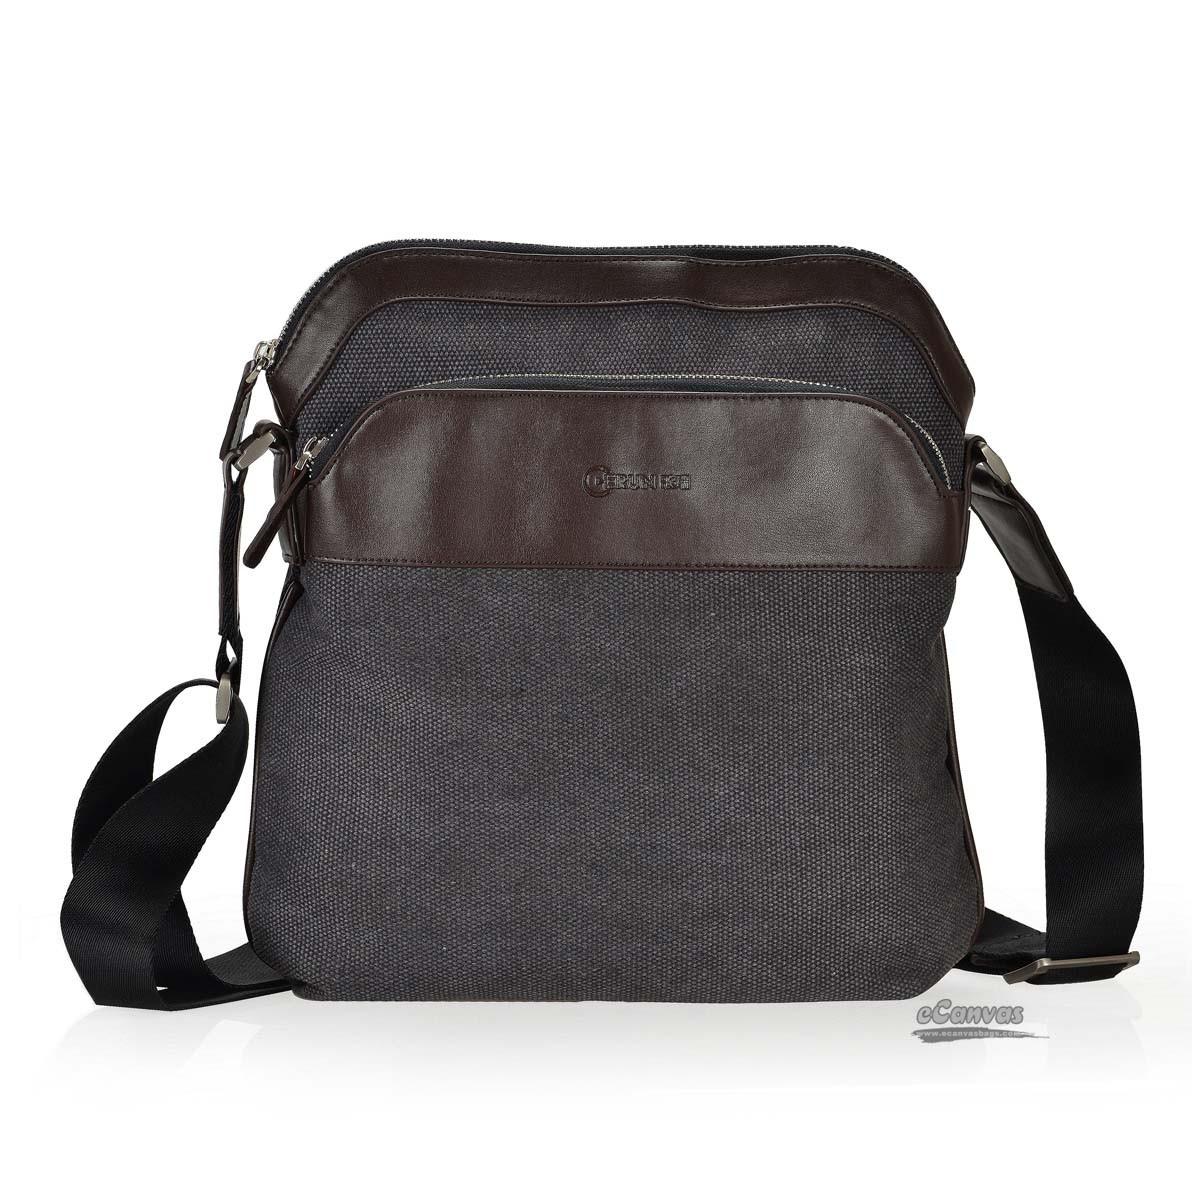 Over the shoulder bag, messanger bag, black, coffee - E-CanvasBags